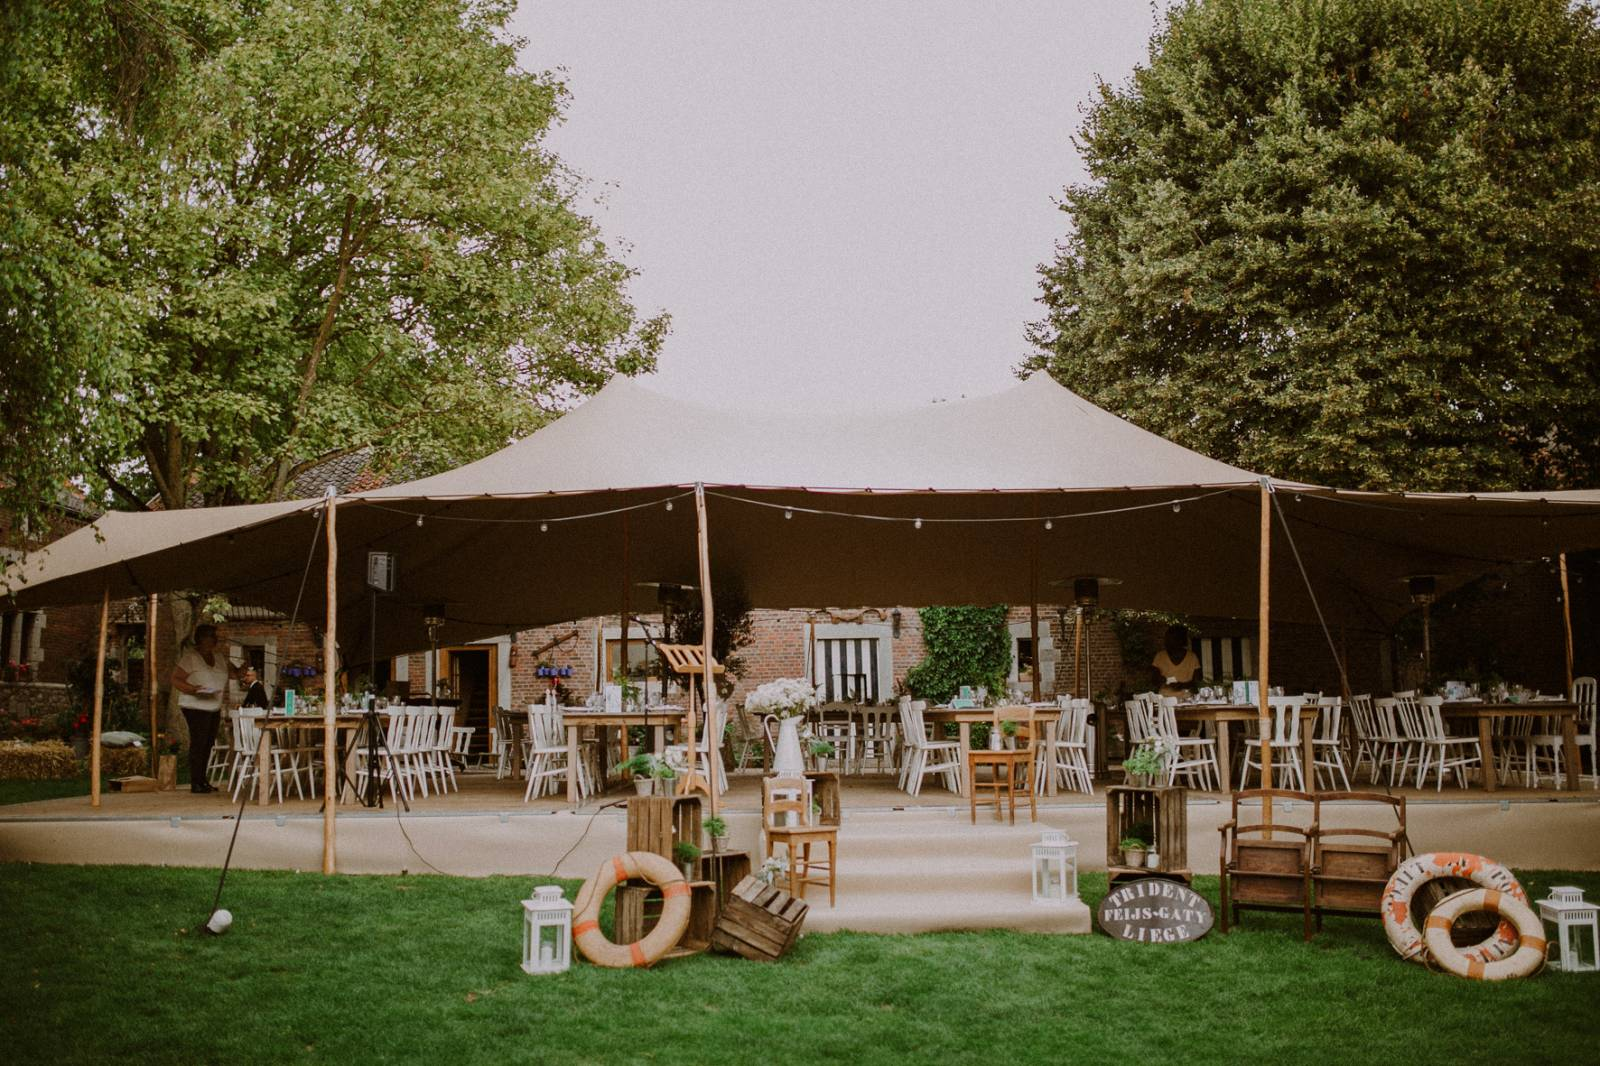 Be Your Guest - Wedding Planner - House of Weddings13-TENTE-2019-Haiku